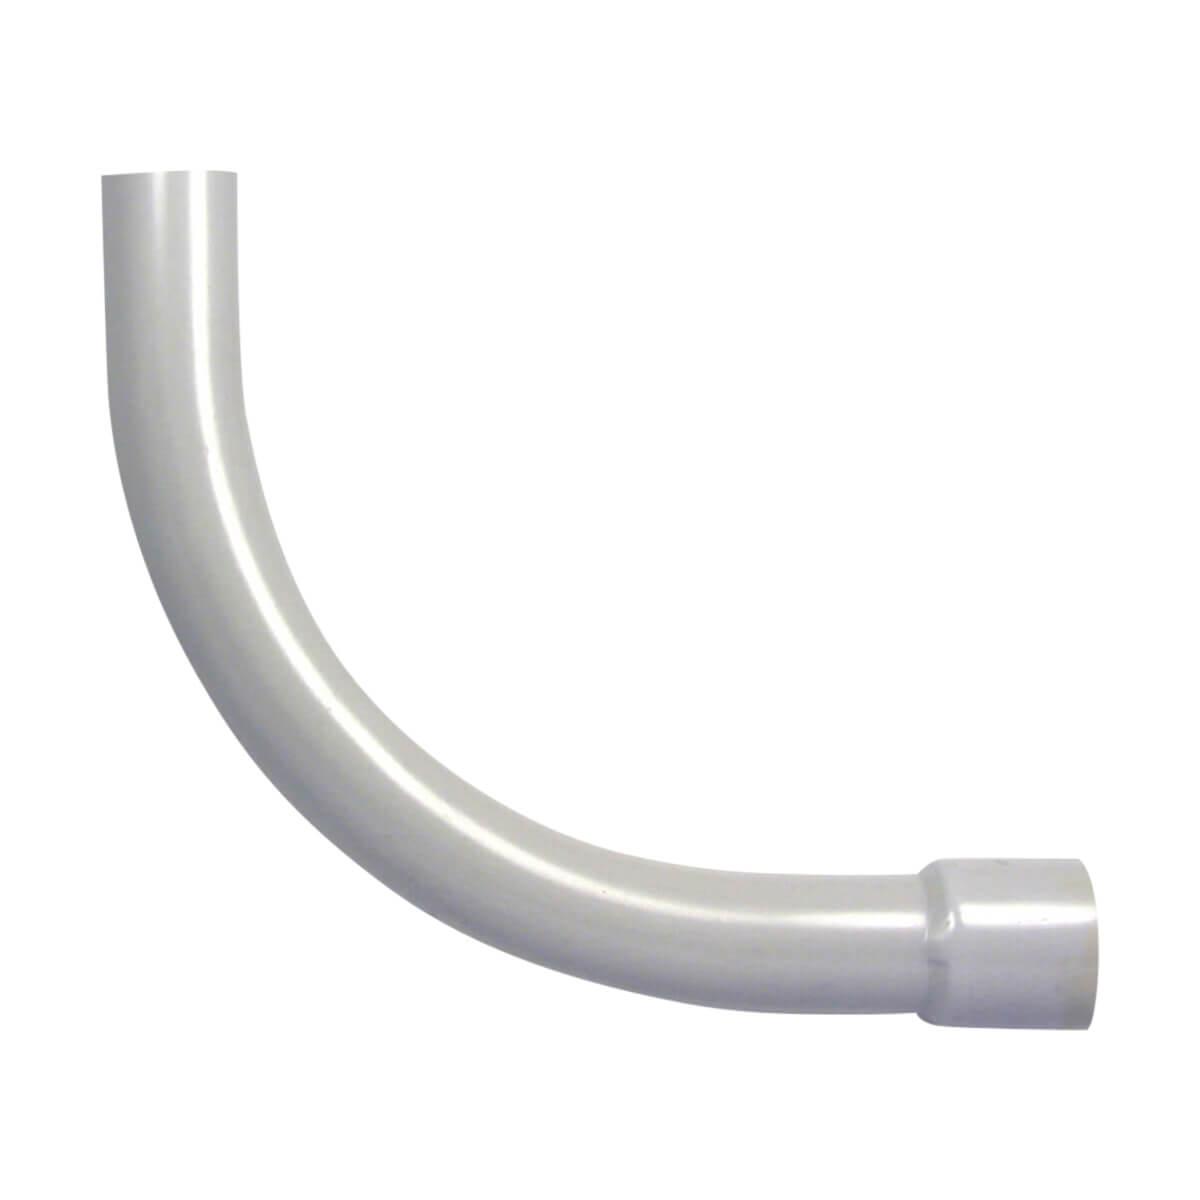 "PVC Conduit 90° Elbow - Bell-end - 1"""